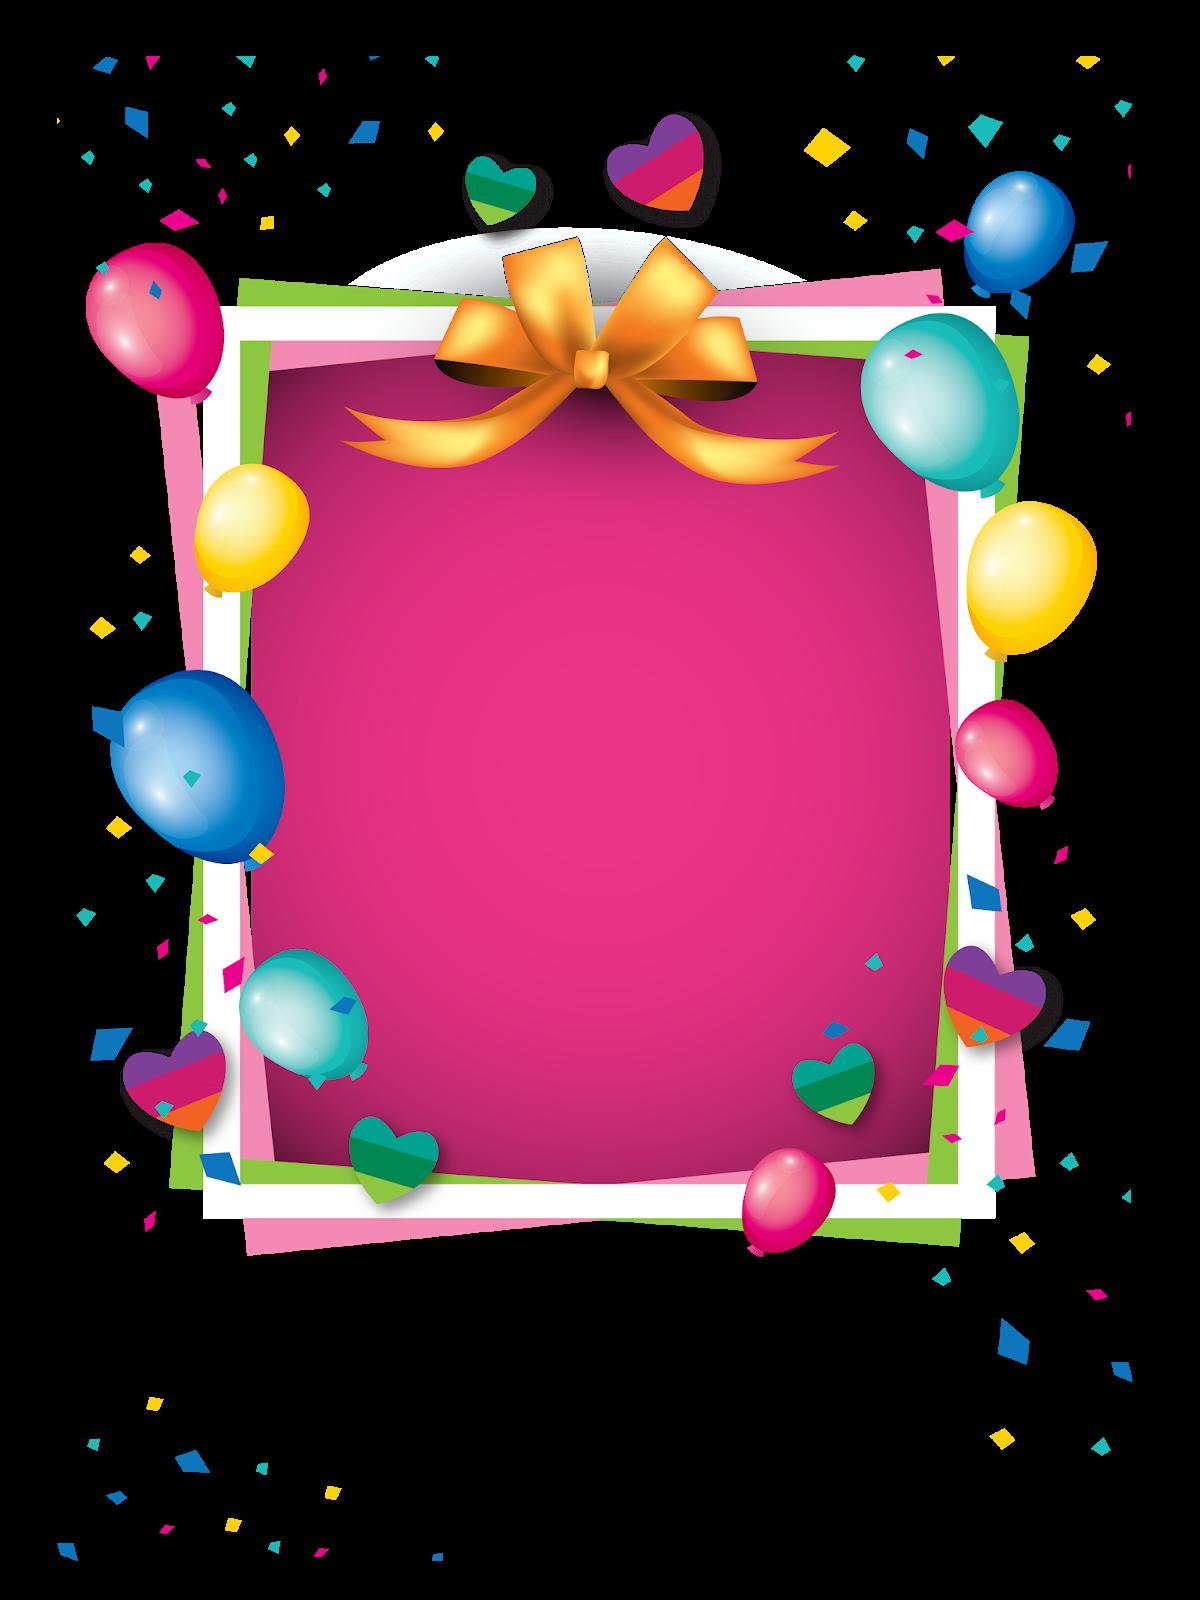 diselfcore: birthday greetings in kannada  |Kannada Birthday Wishes